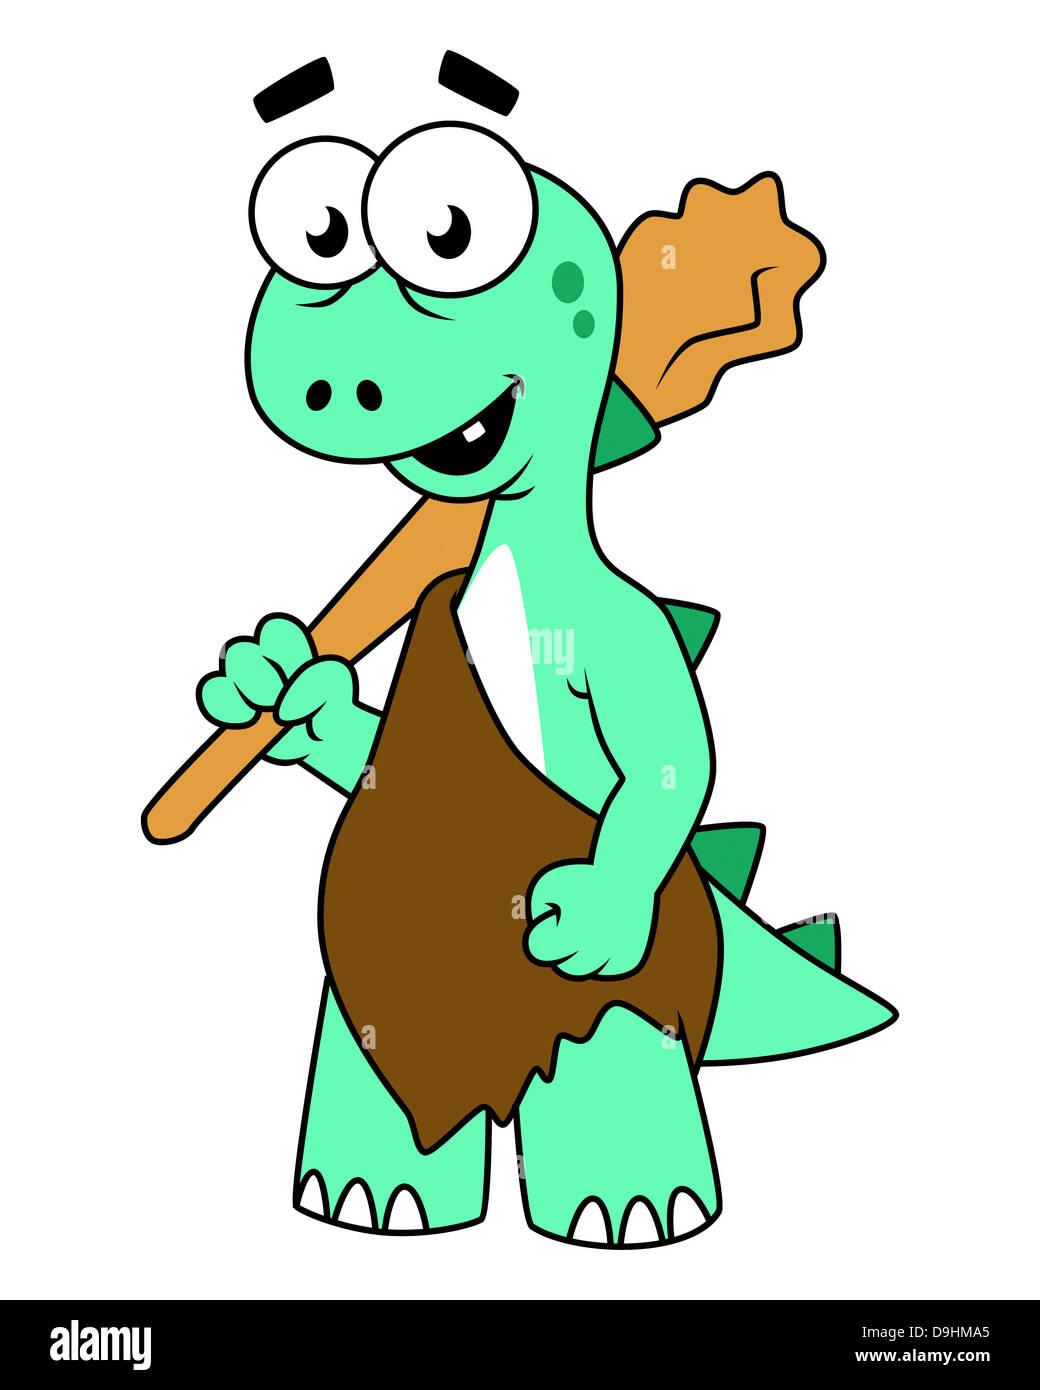 Cartoon illustration of a Tyrannosaurus Rex caveman. - Stock Image